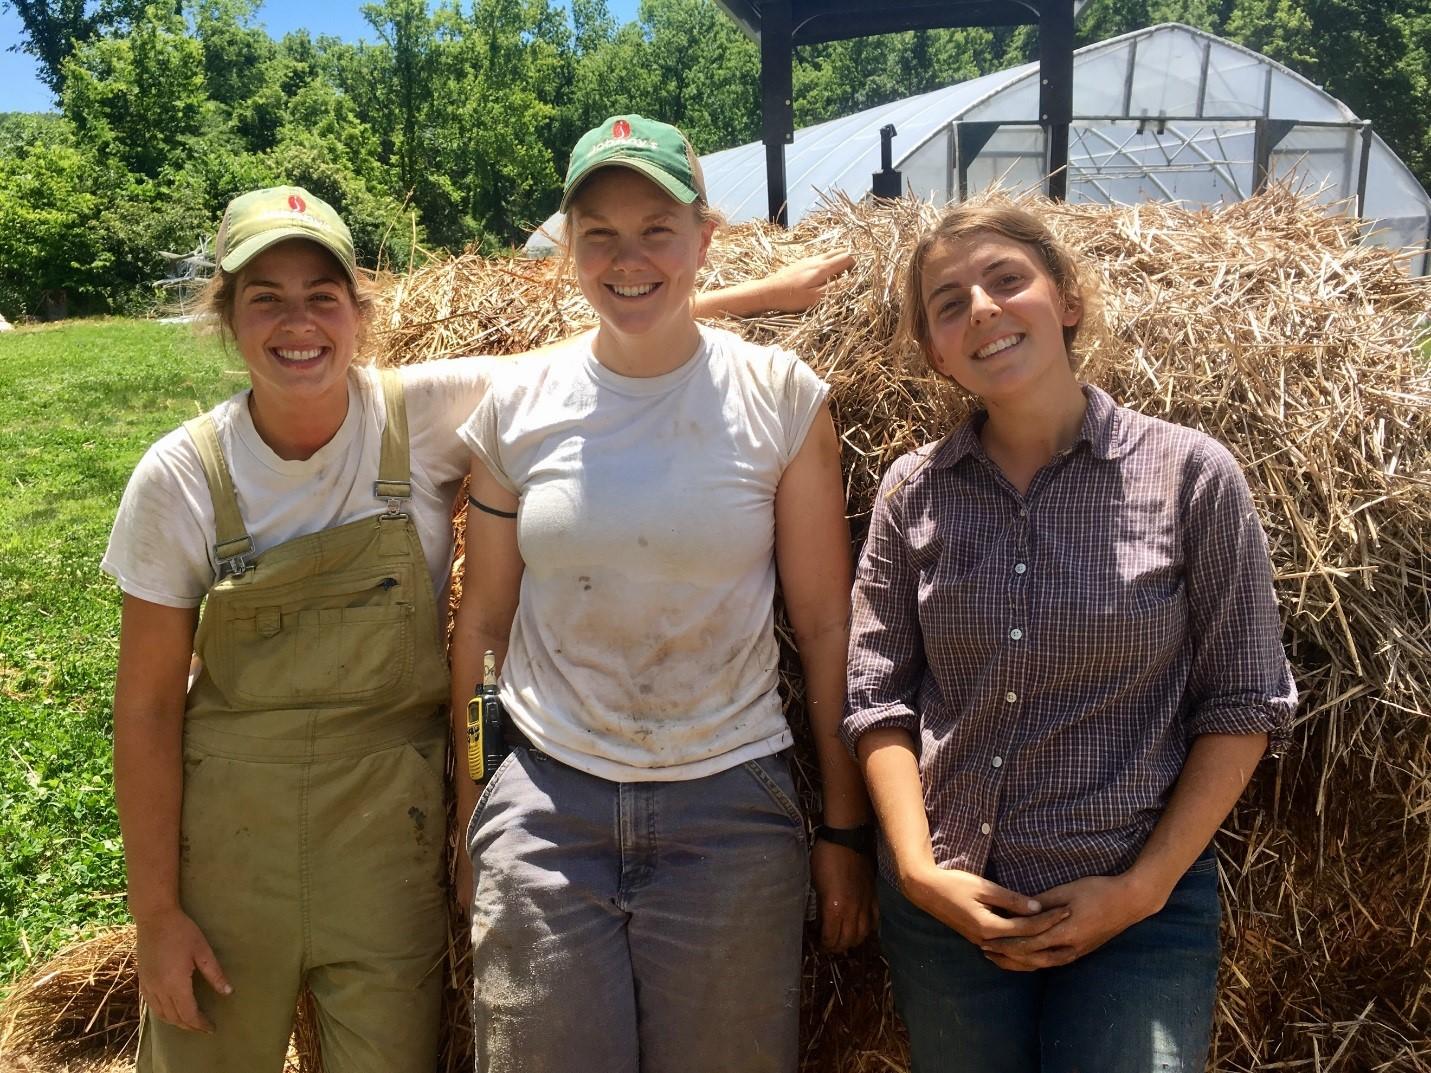 Lauren, Amanda and Kerry on Liz's farm.